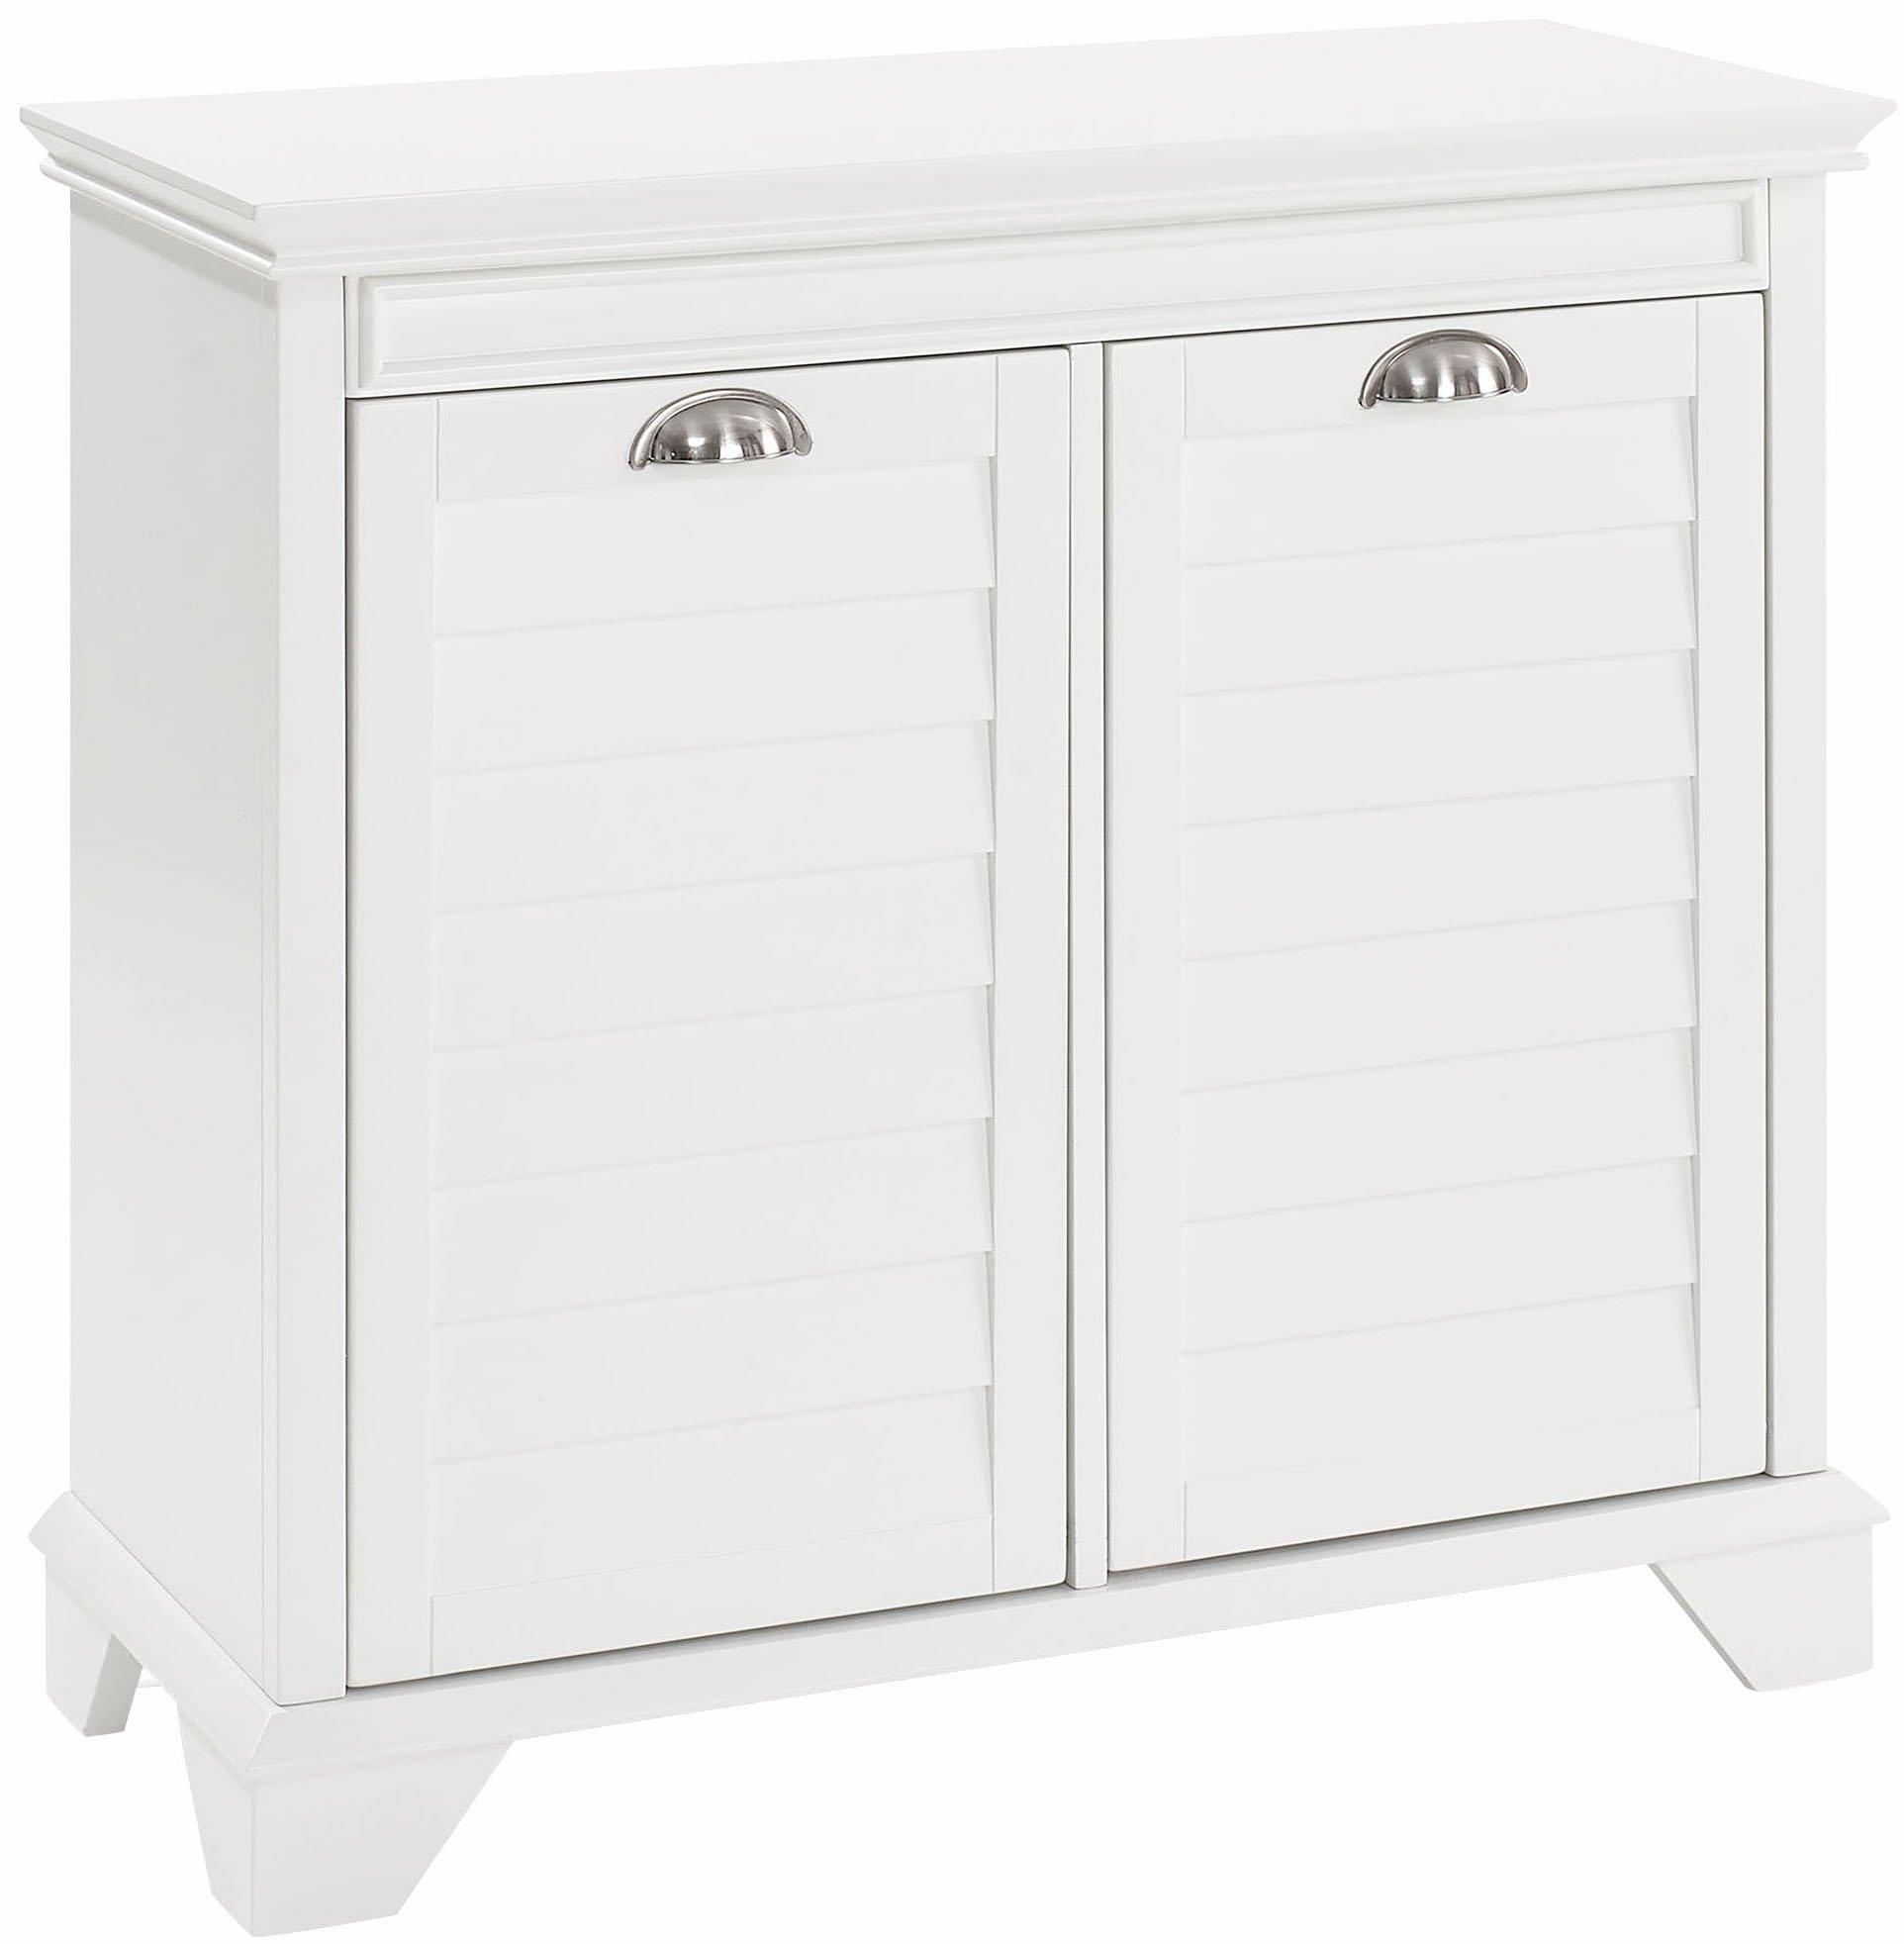 Crosley Furniture Lydia Two-Compartment Linen Hamper - White by Crosley Furniture